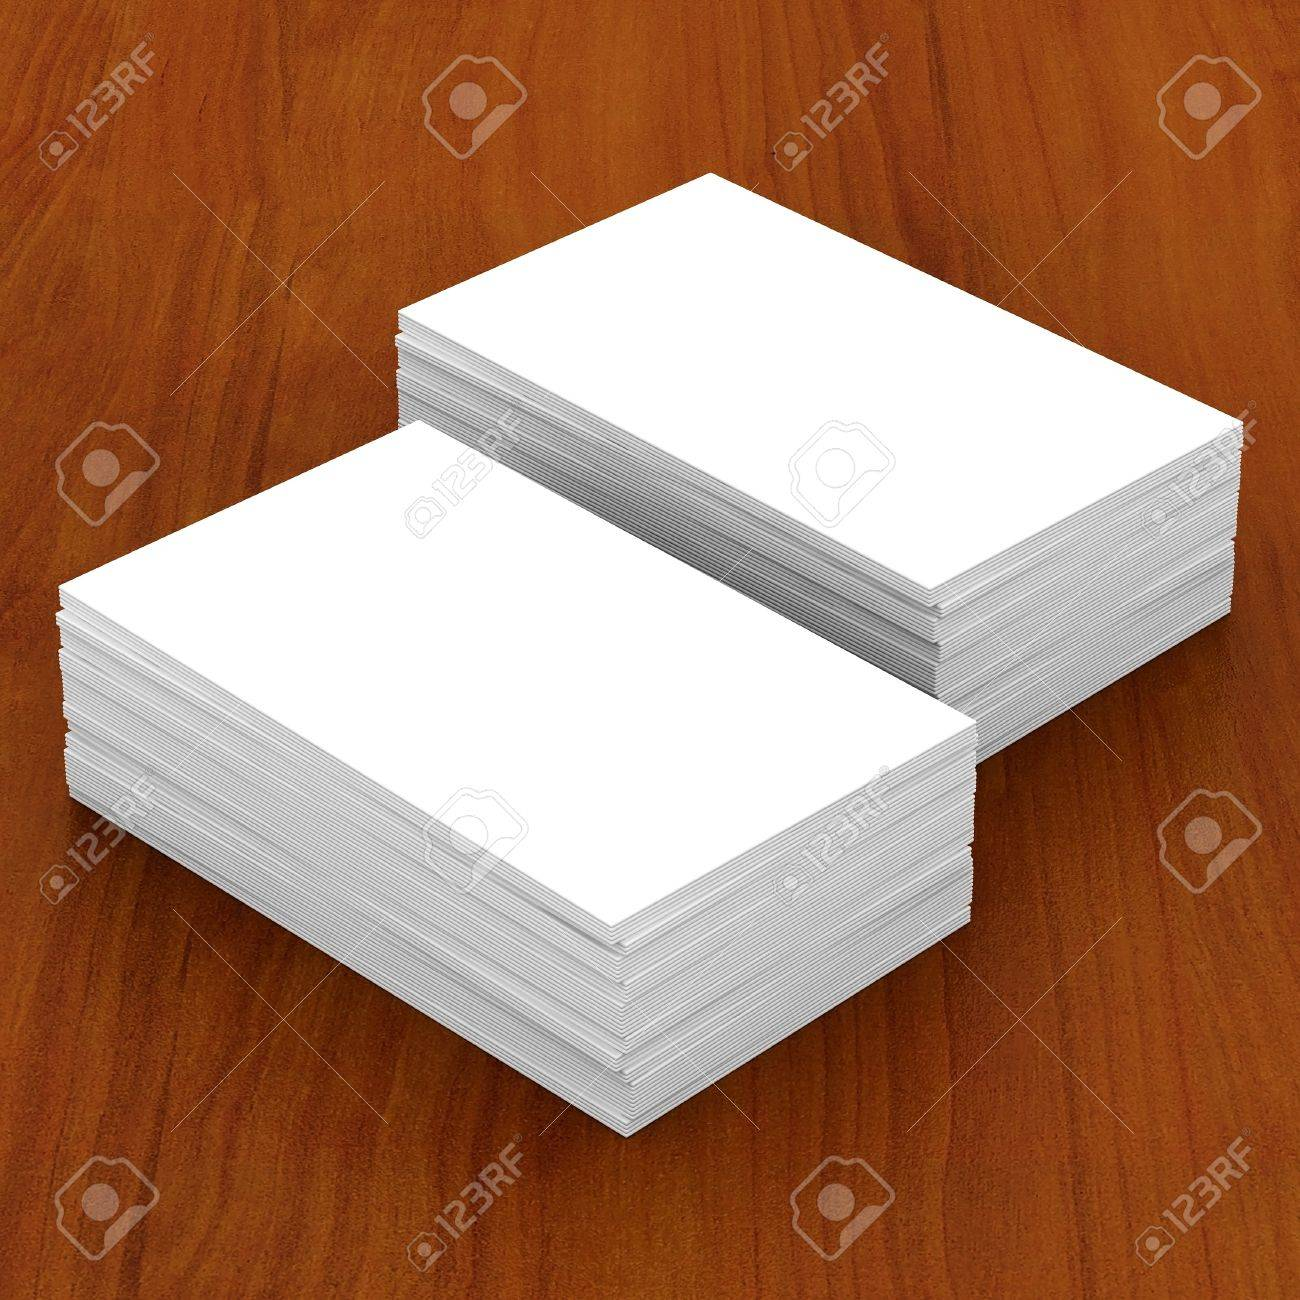 Les Cartes De Visite Maquettes Blanc